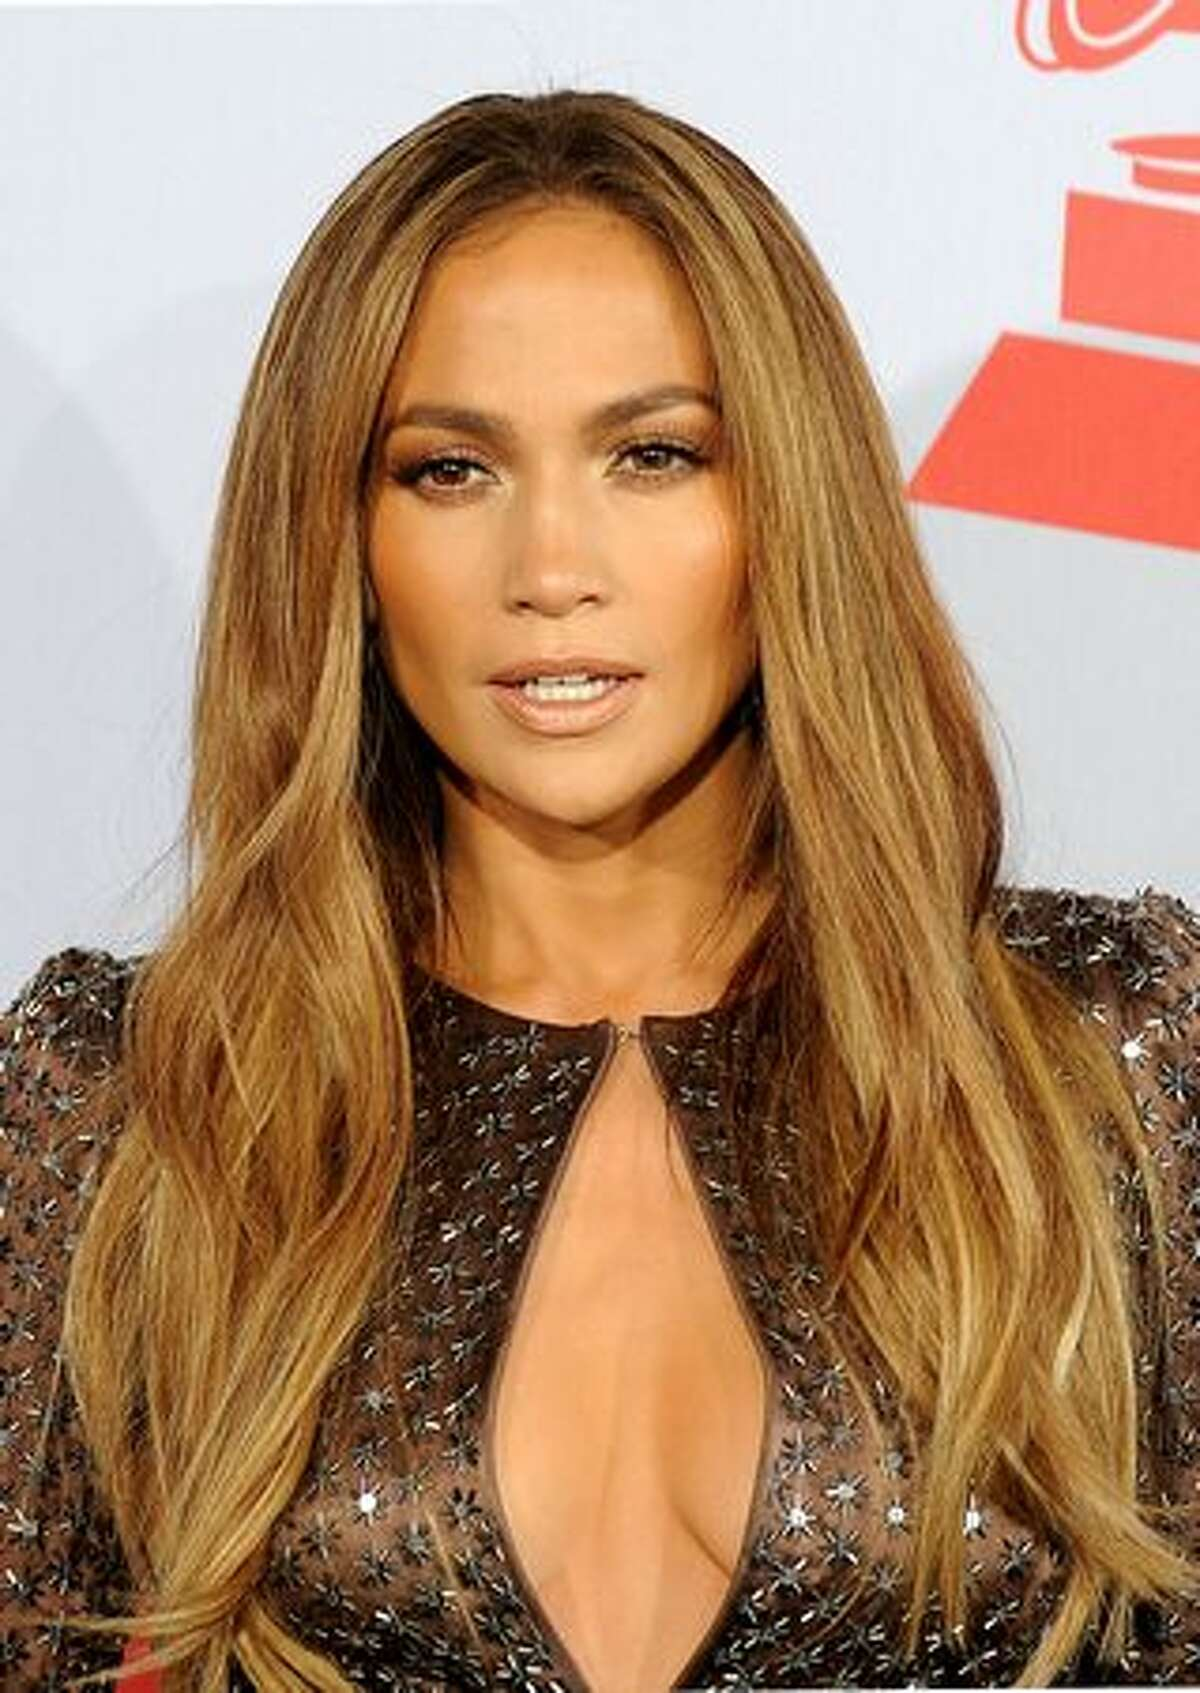 Jennifer Lopez arrives for the 11th Annual Latin Grammy Awards in Las Vegas, Nevada.